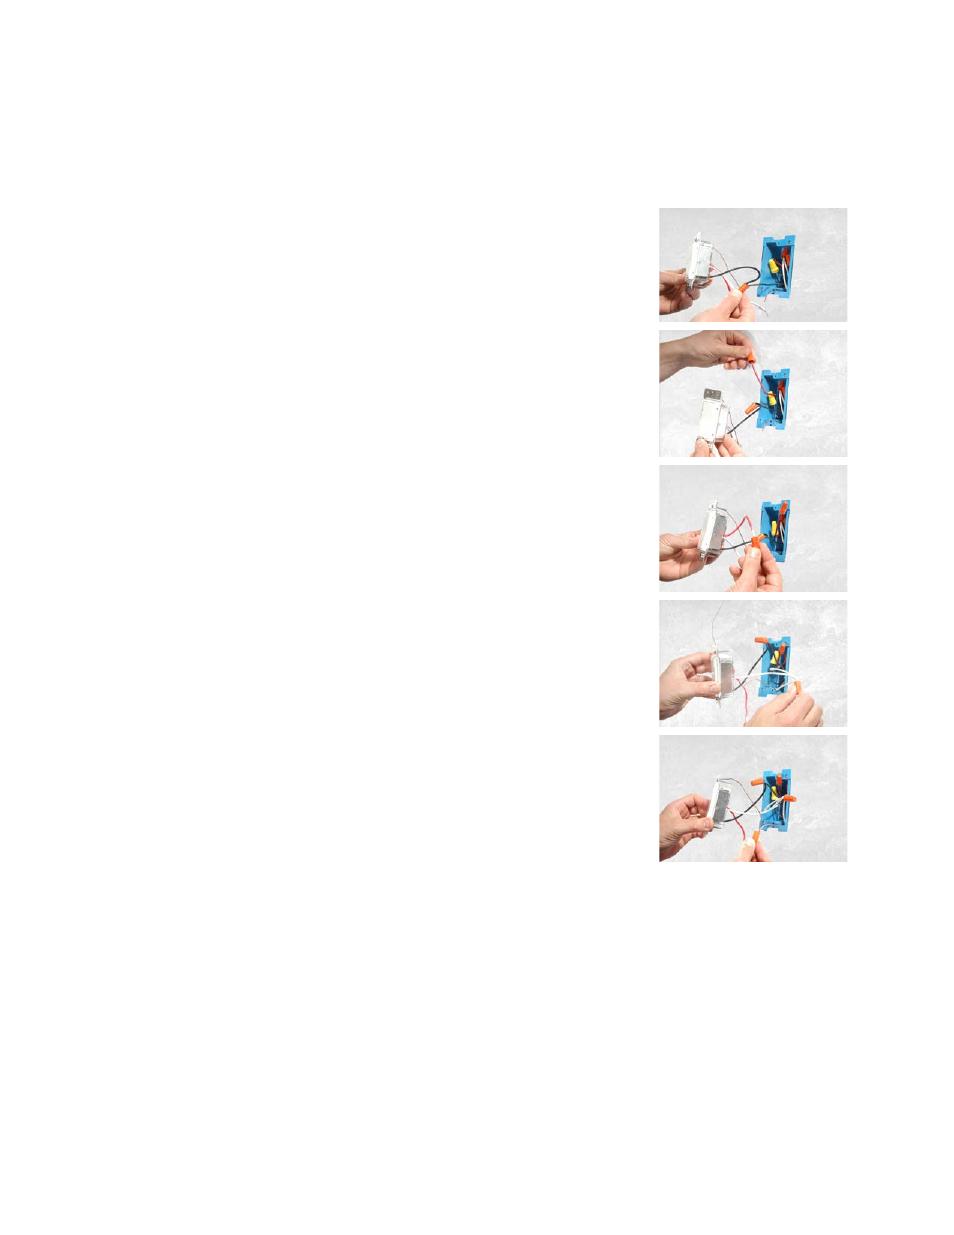 INSTEON KeypadLinc Relay (2487S) Manual User Manual | Page 10 / 25